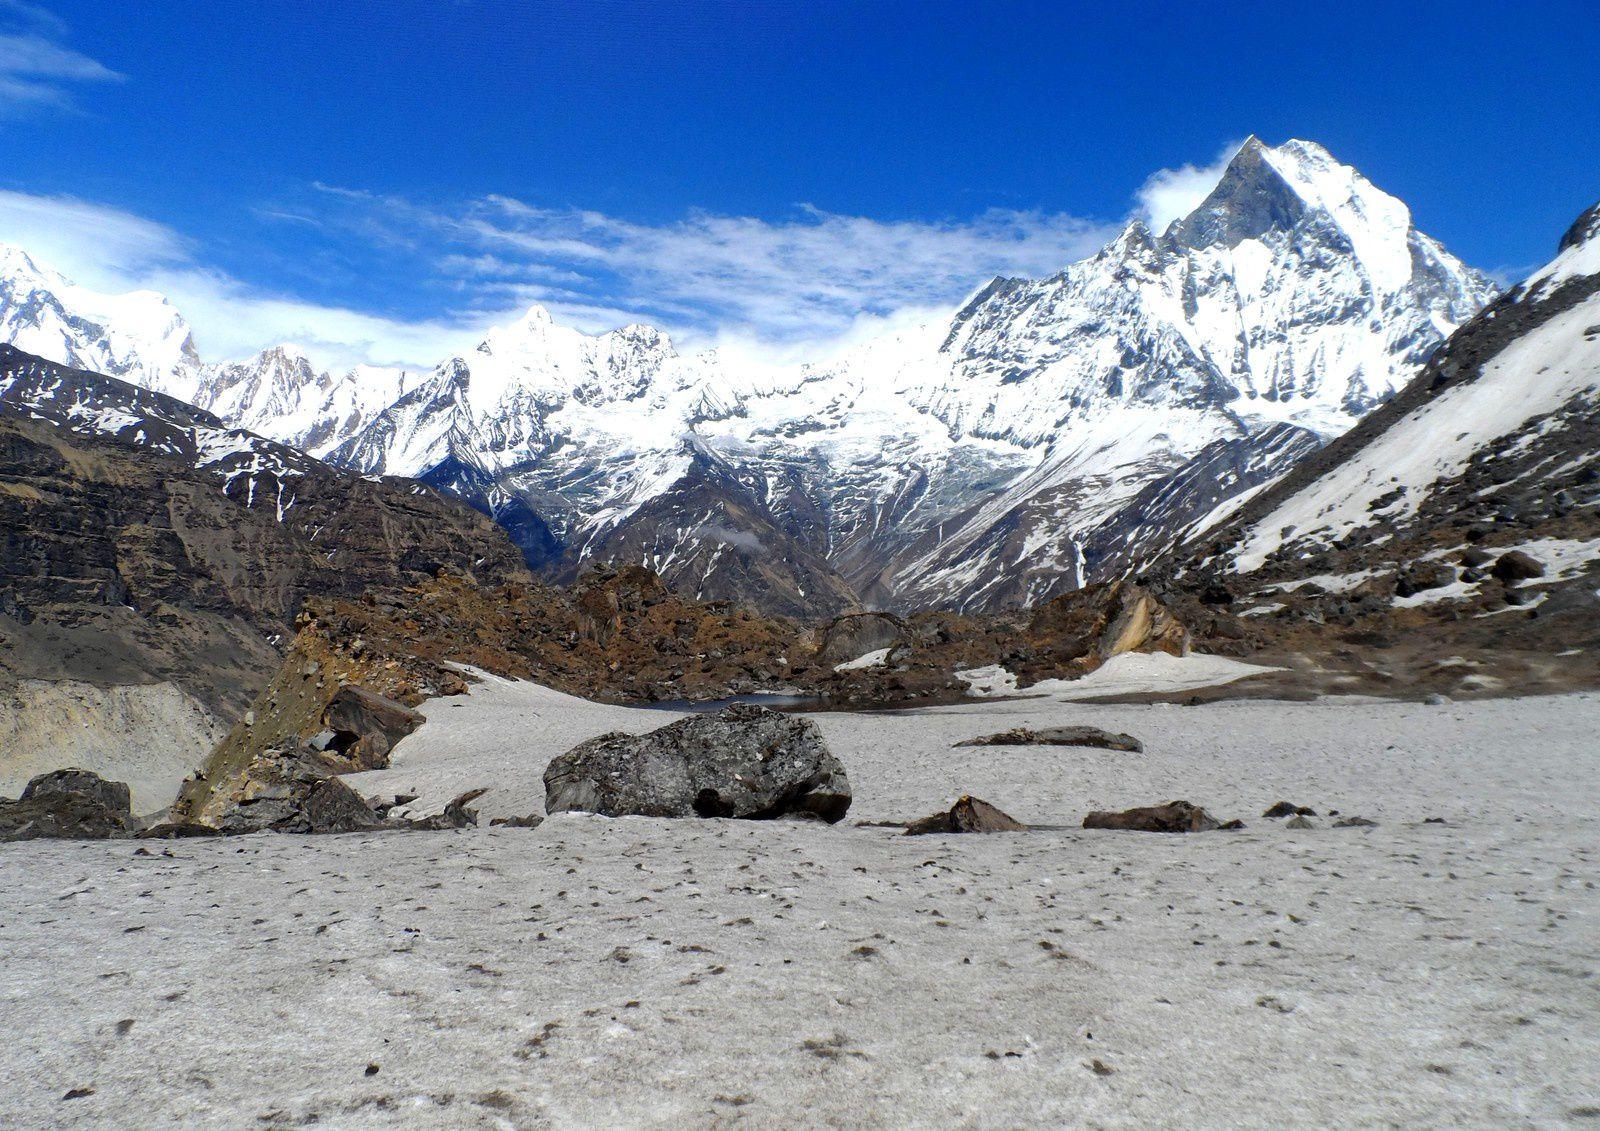 Le camp de base de l'Annapurna